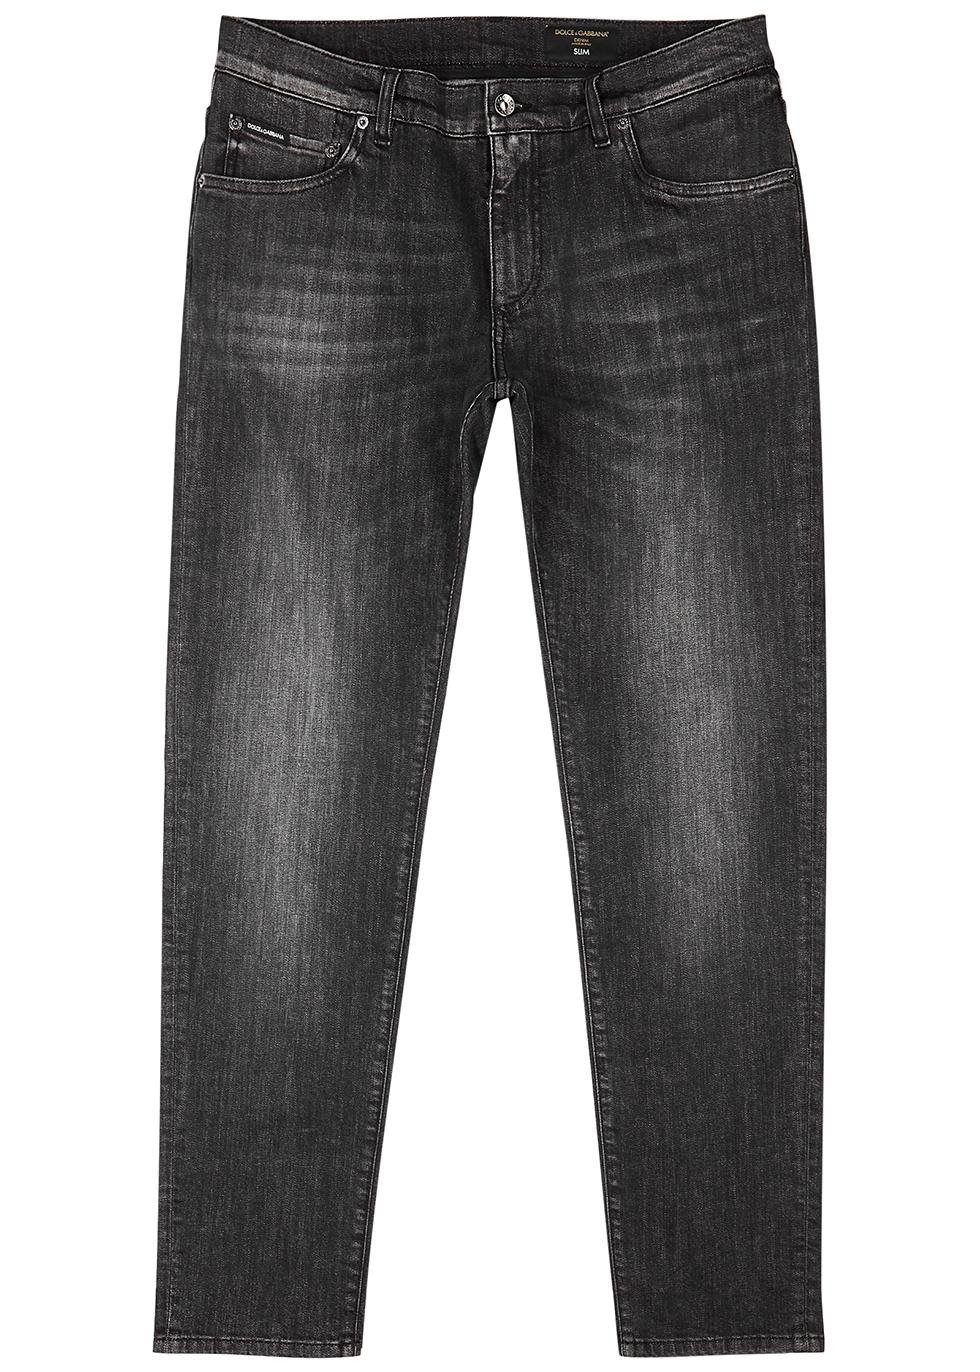 Jeans Off white for Women Dark Grey